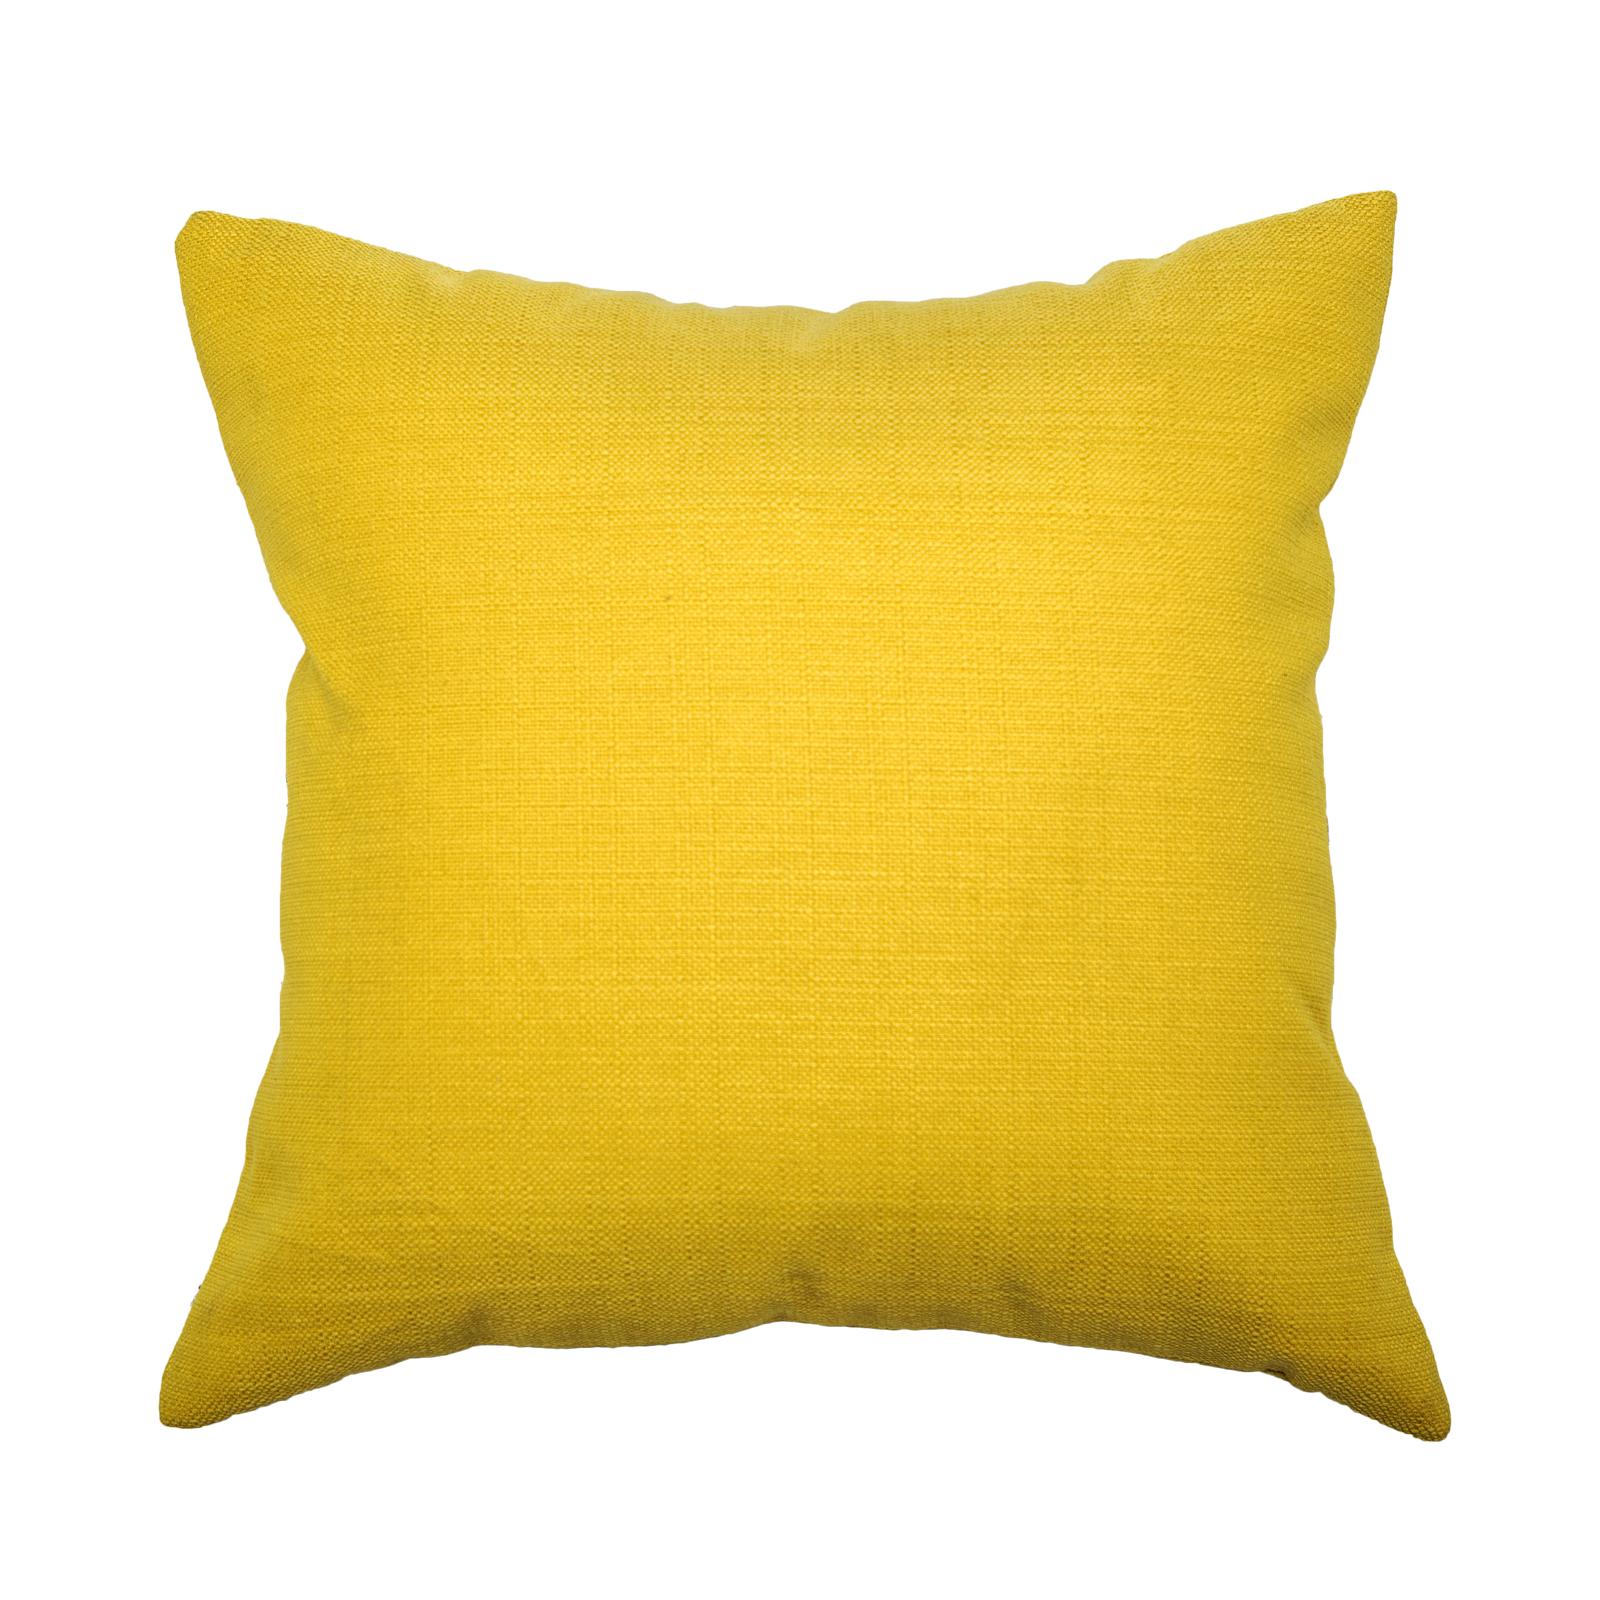 Throw Pillow Rental : Throw Pillow Rentals Trade Show Rental Delivery FormDecor